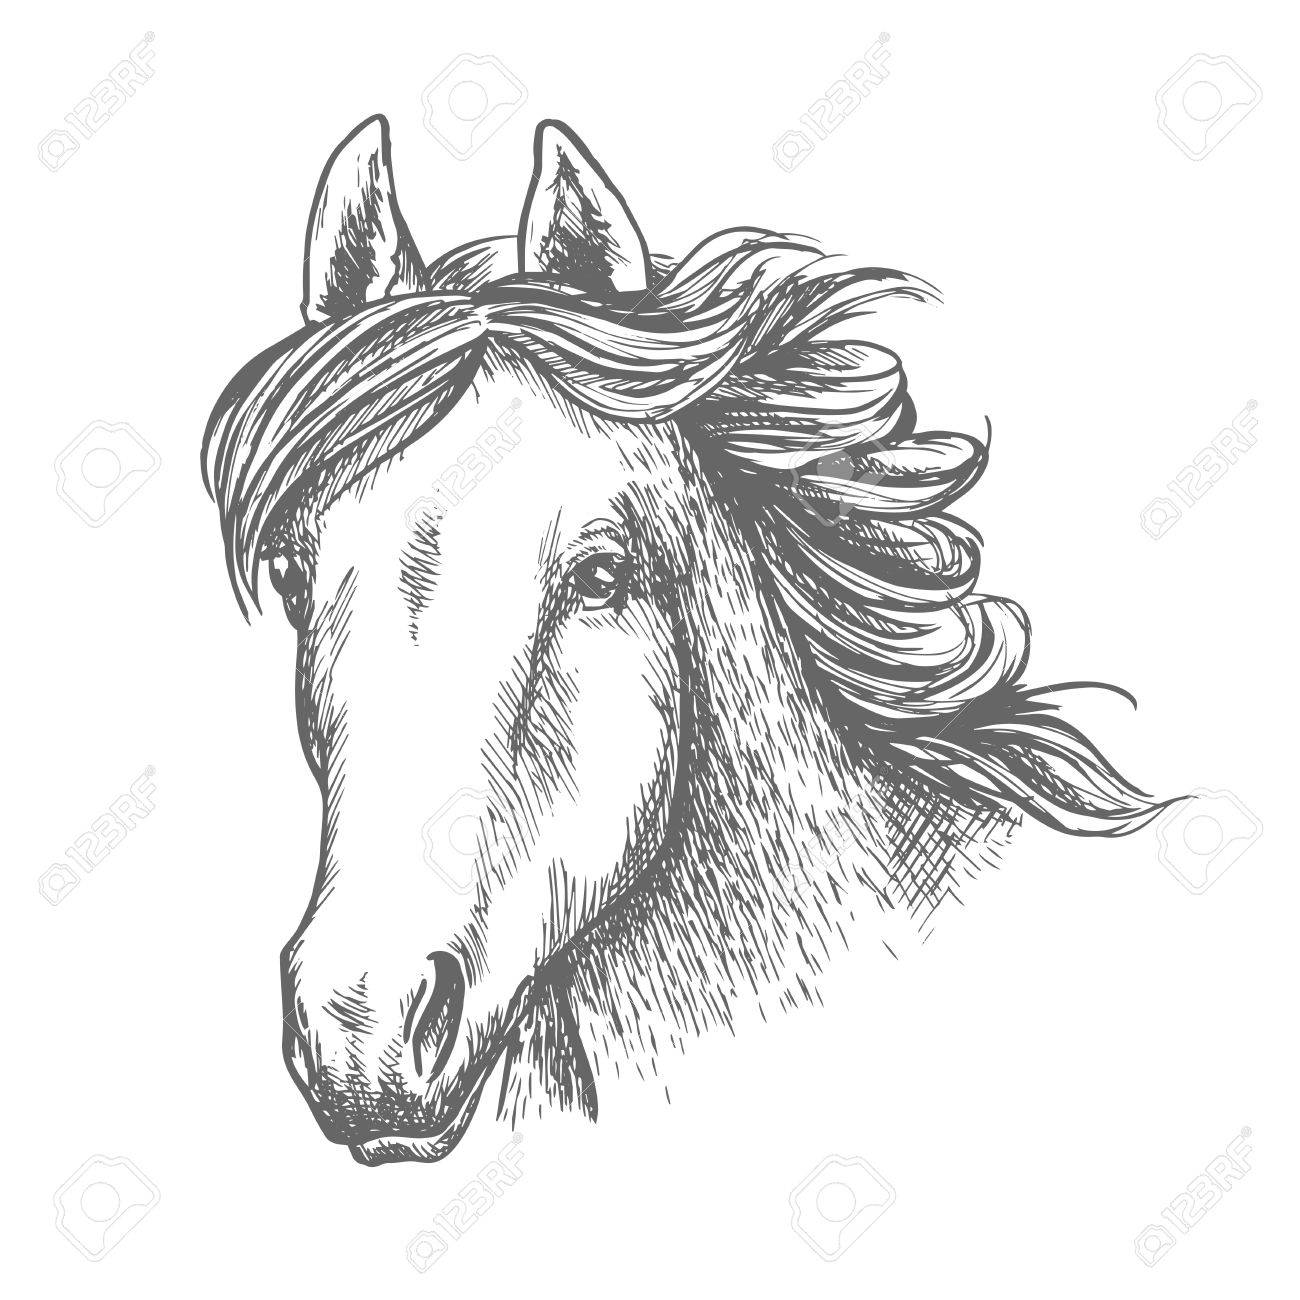 1300x1300 Horse Head Sketch Of Arabian Mare Horse. Isolated Racehorse Head